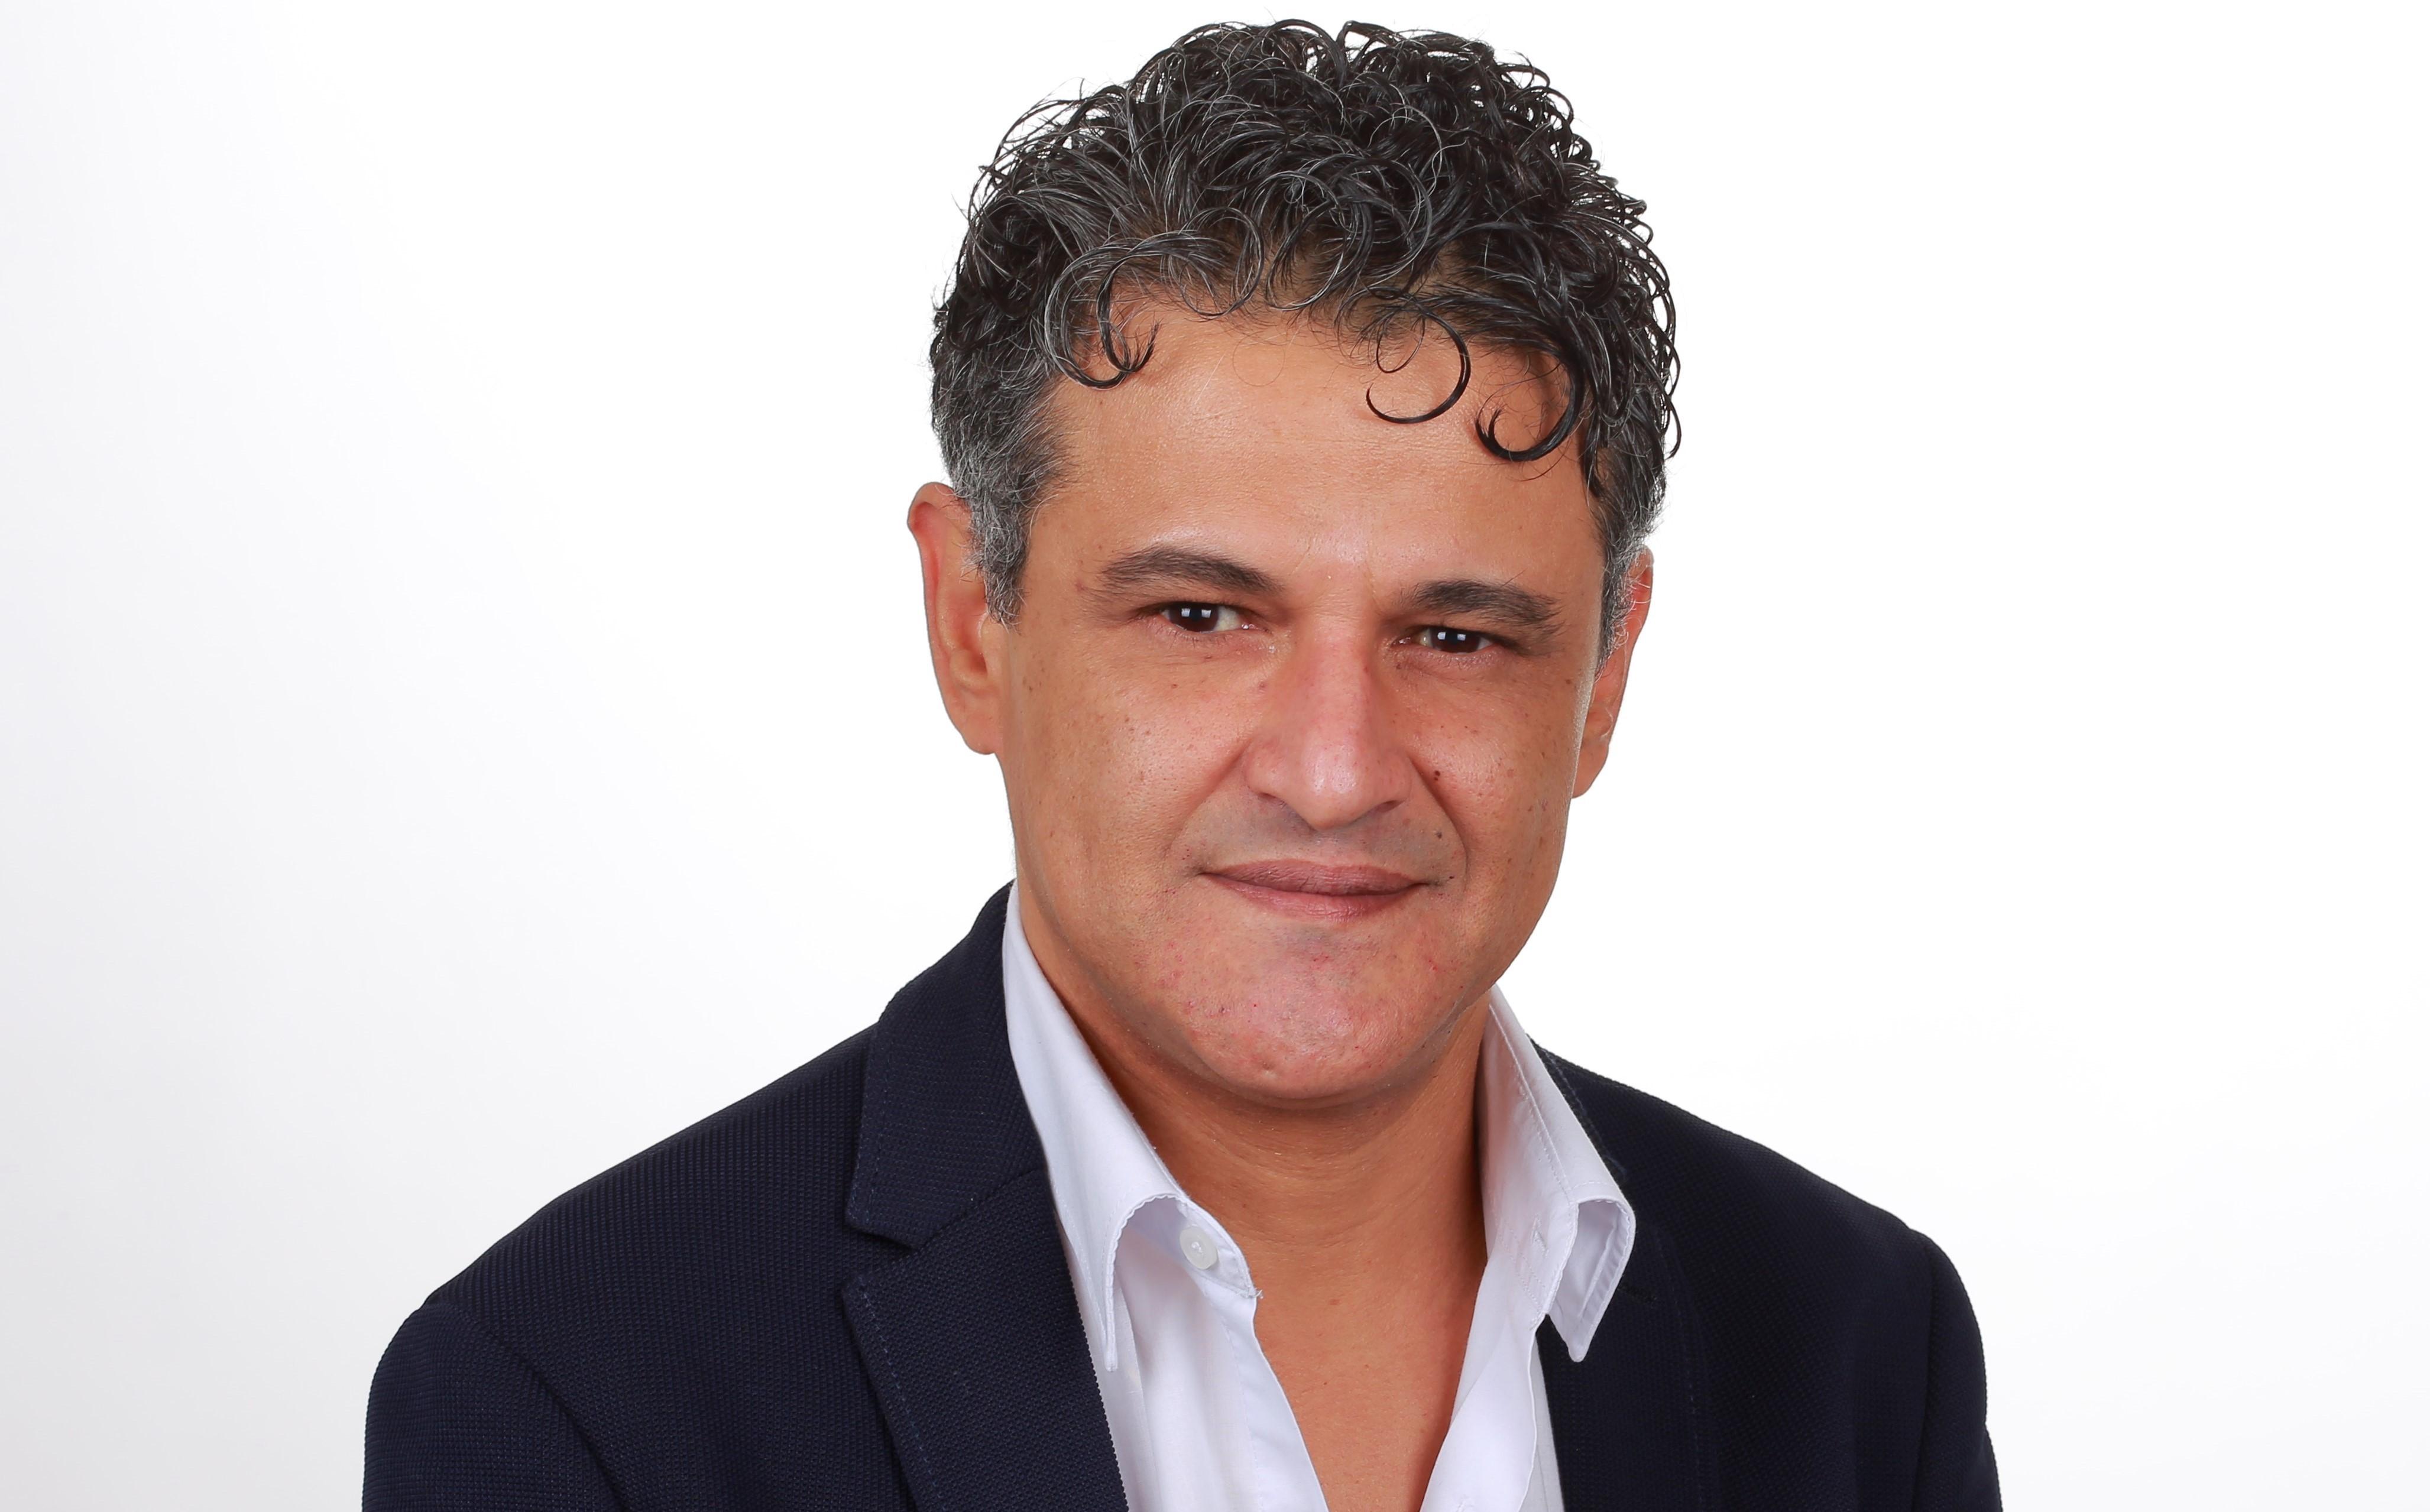 hicham rouzzak هشام روزاق